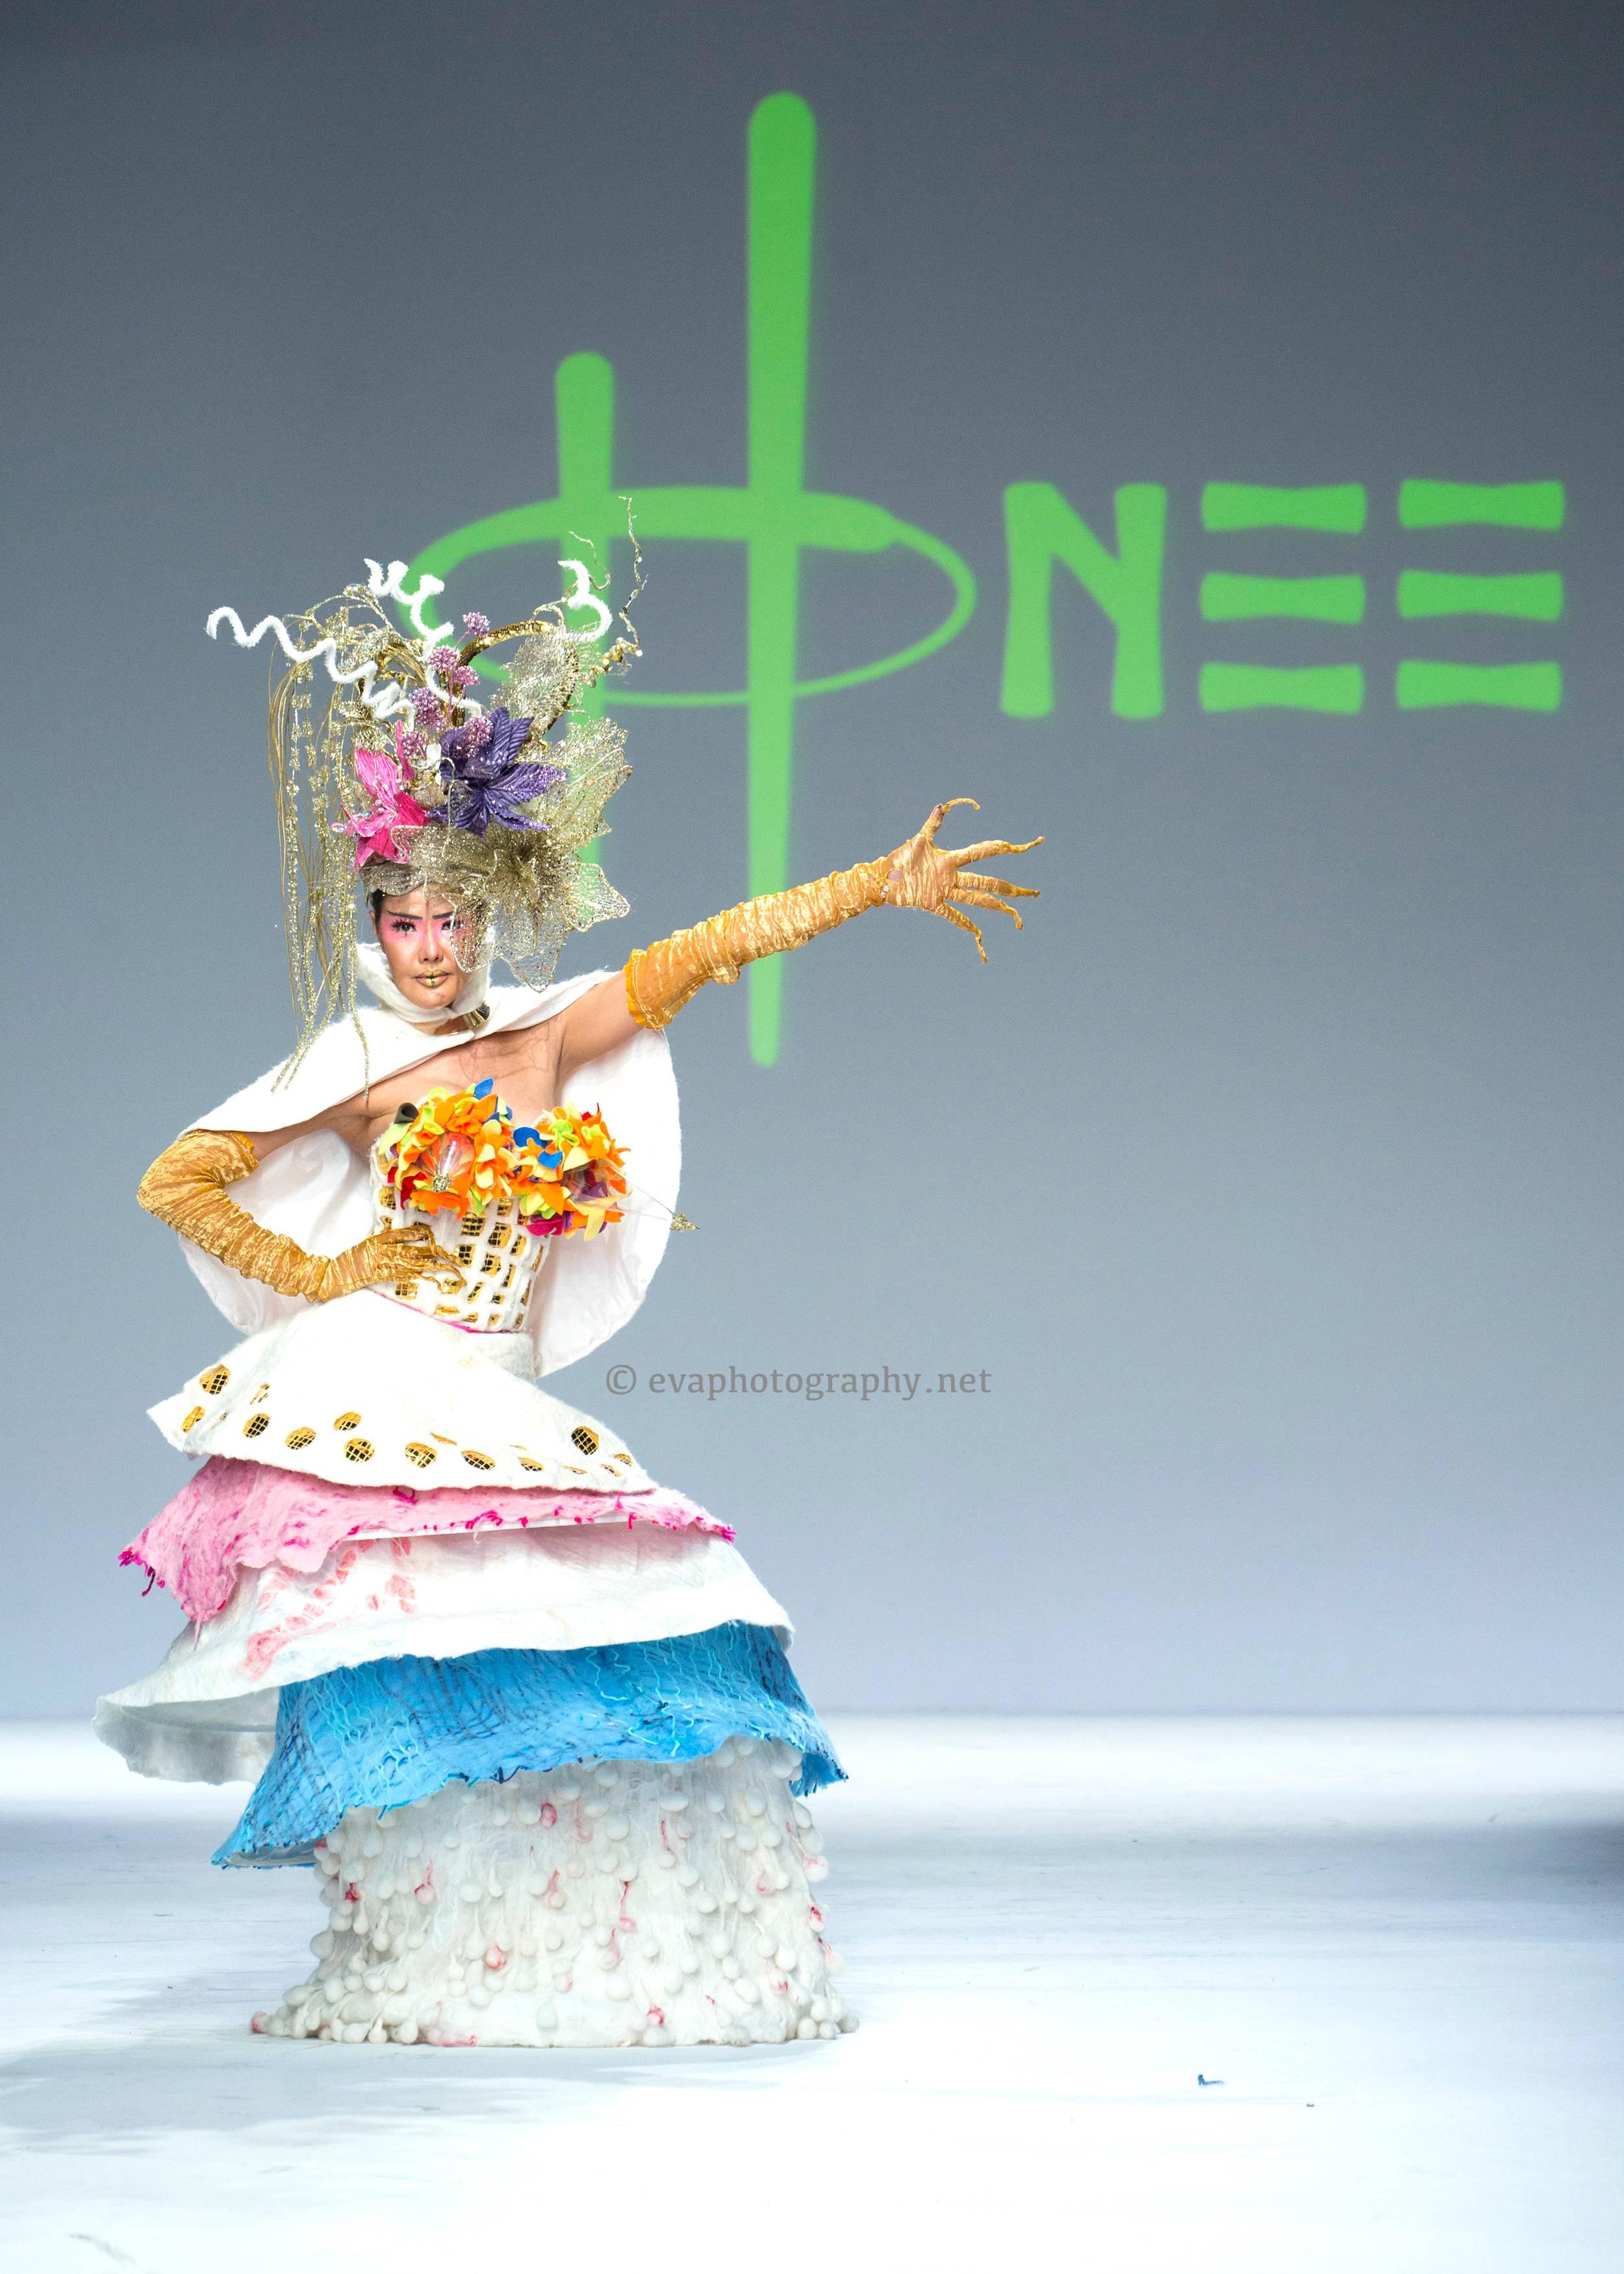 Honee SS18   Style Fashion Week